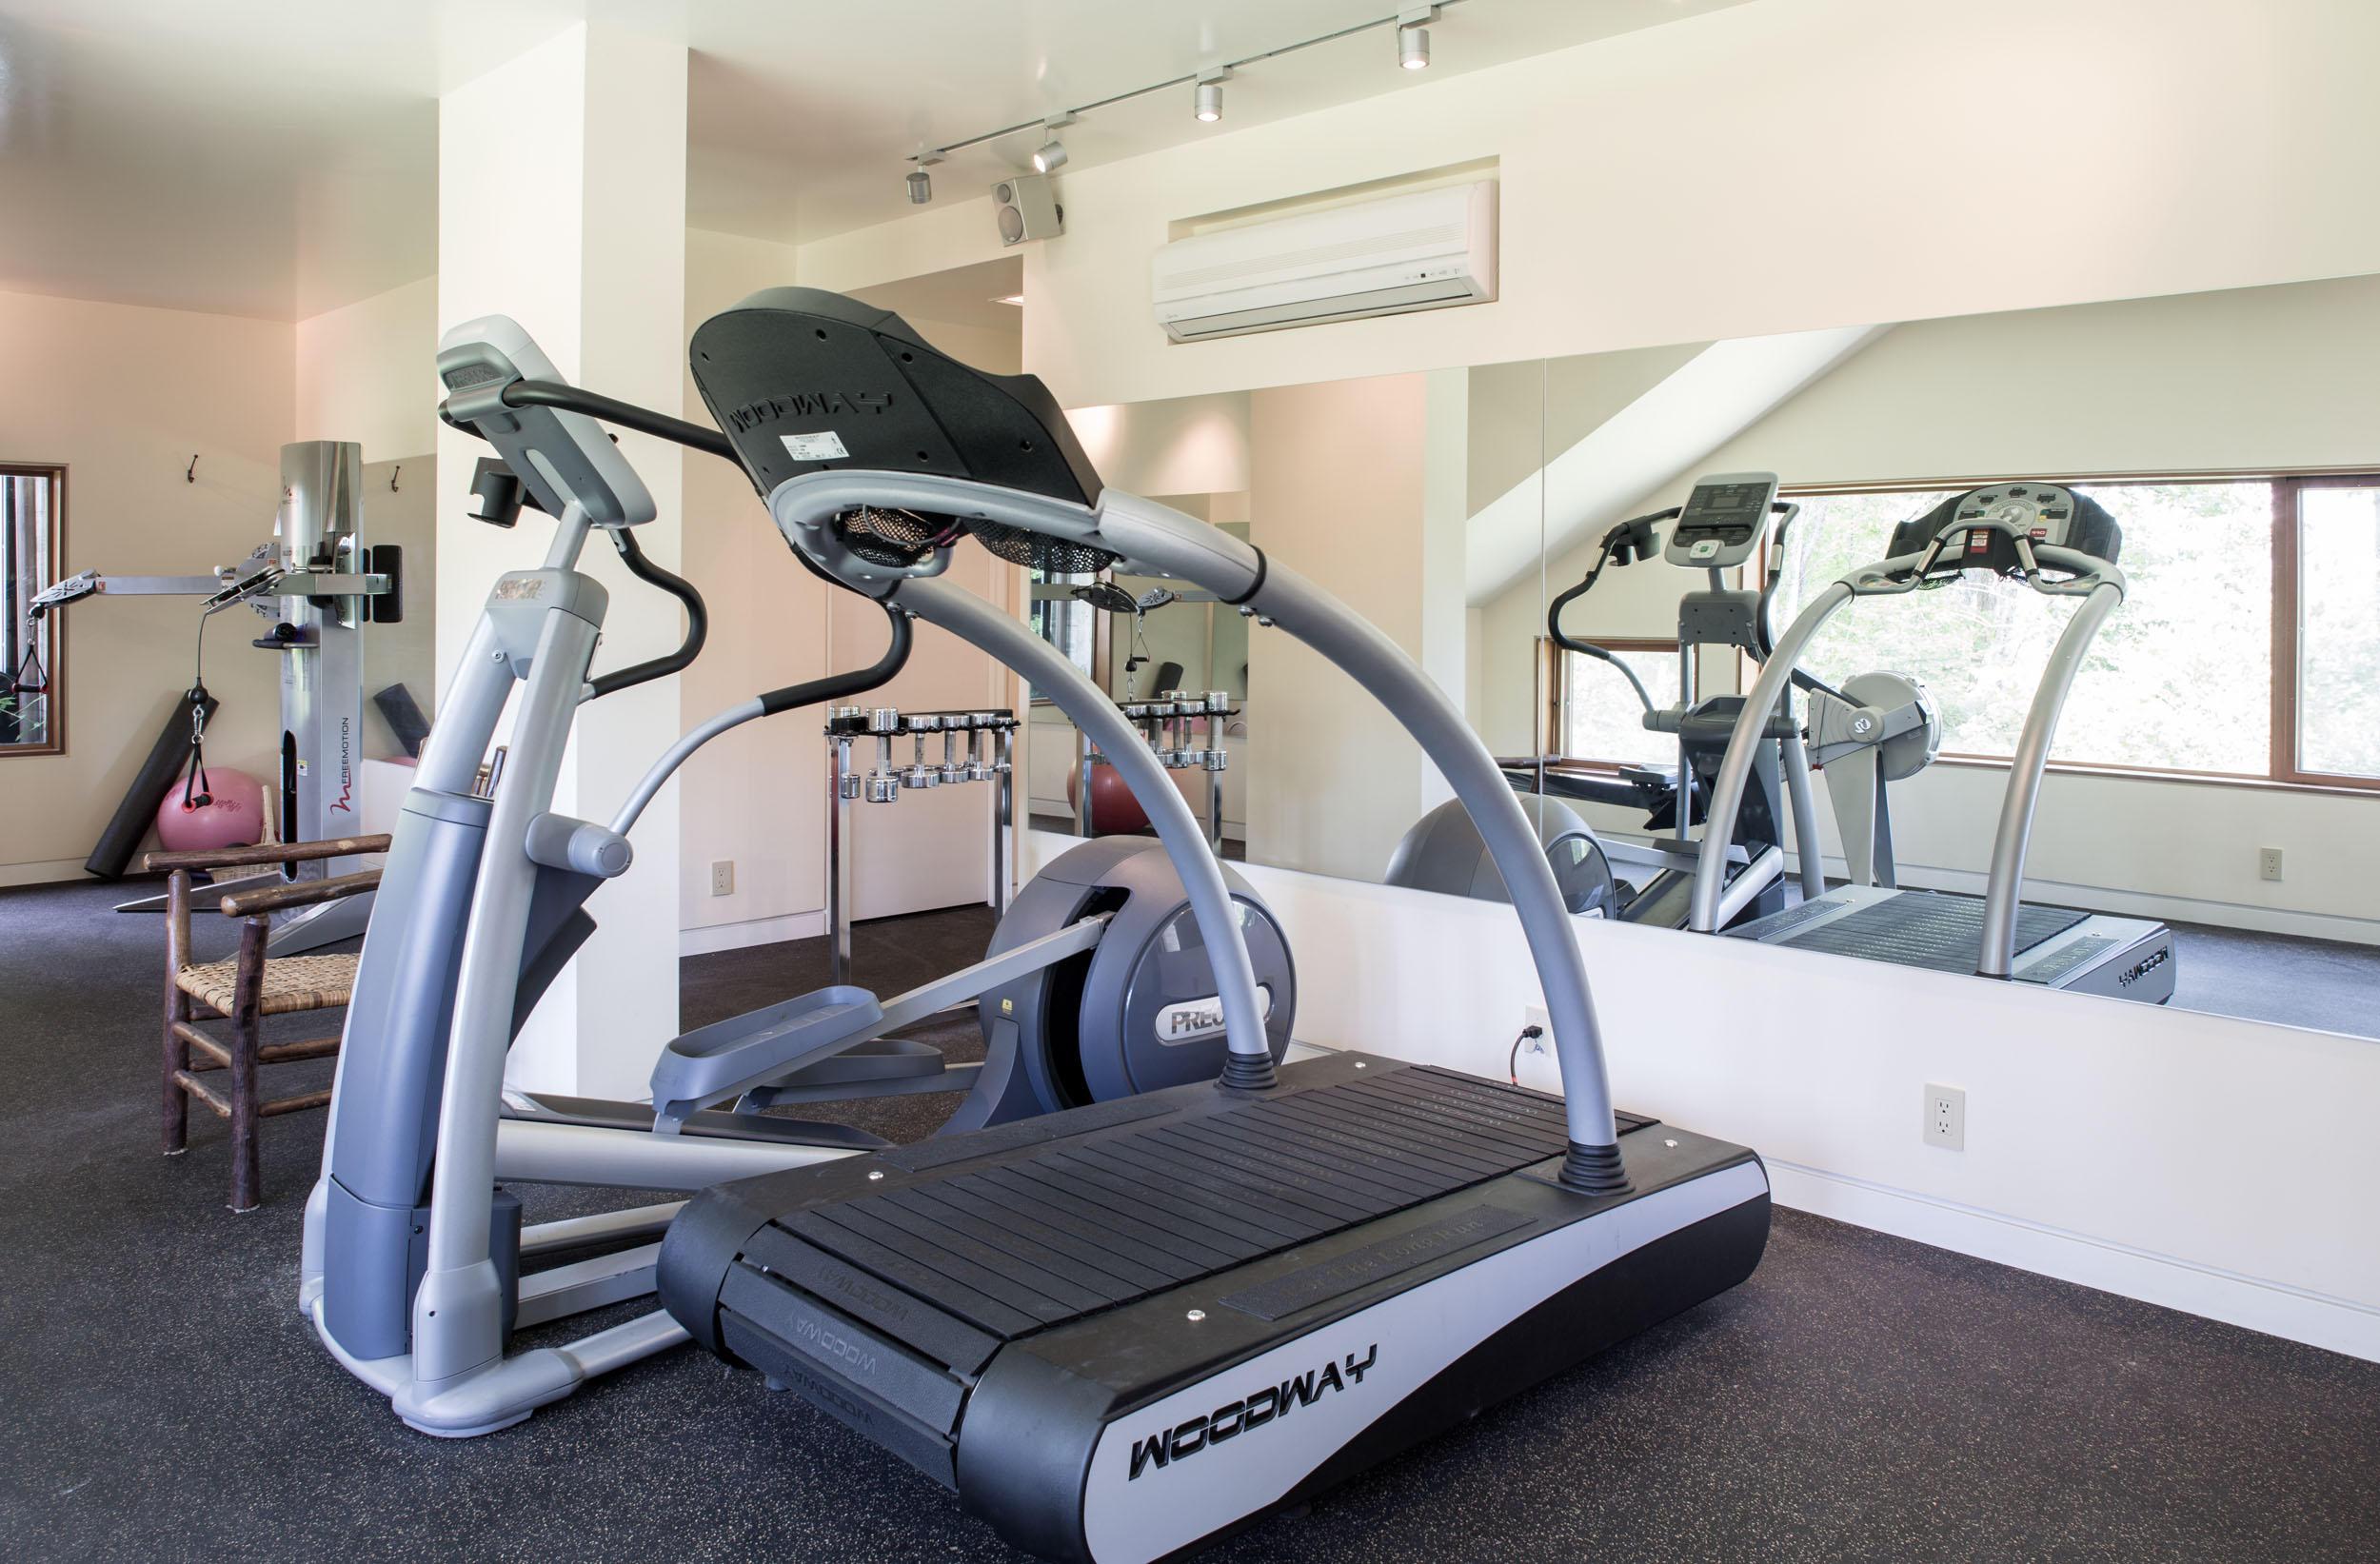 Lodge Gym